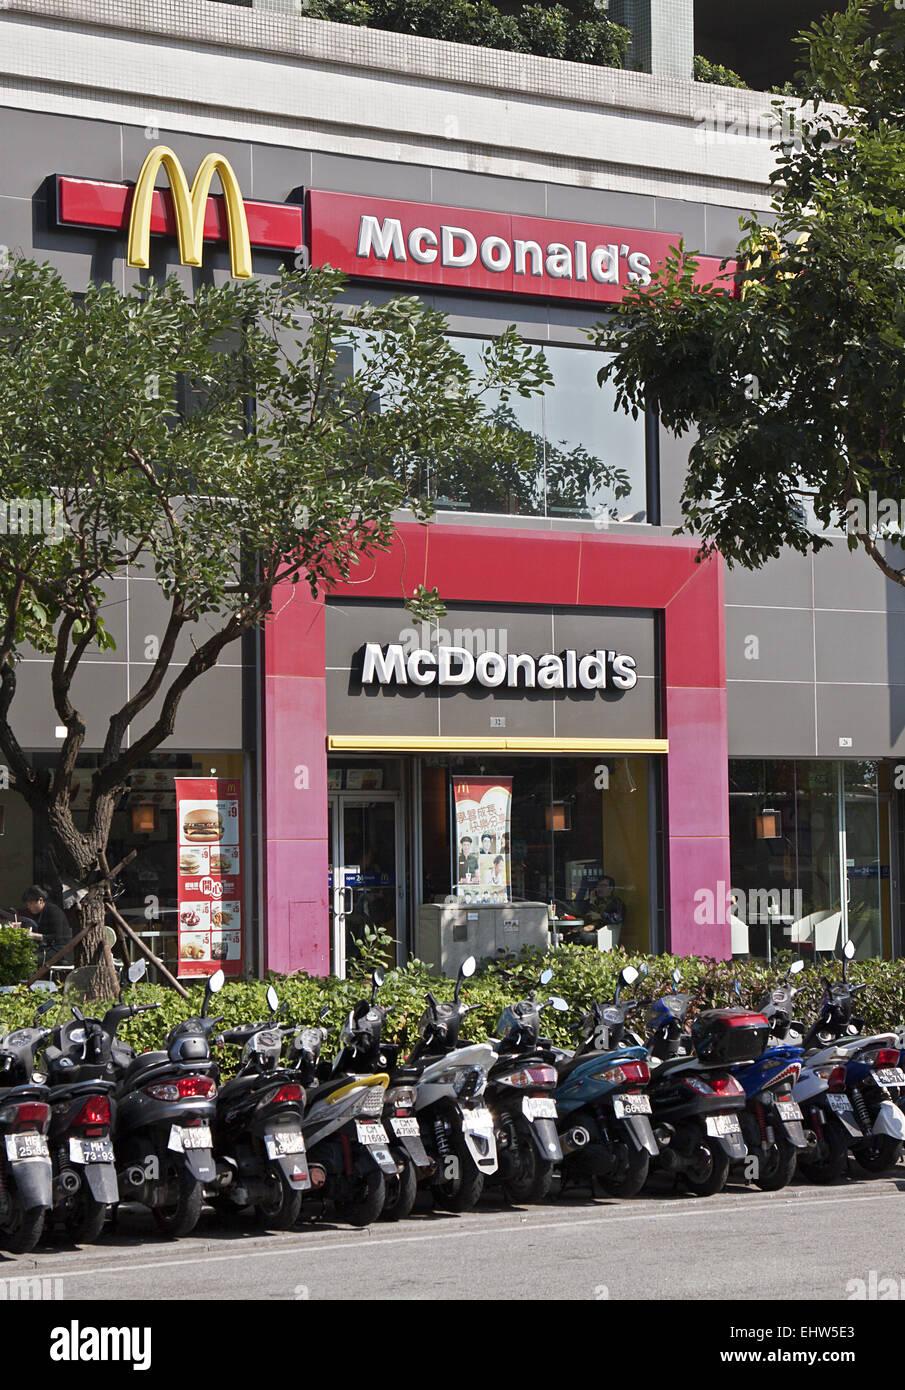 McDonald's Macau Stock Photo